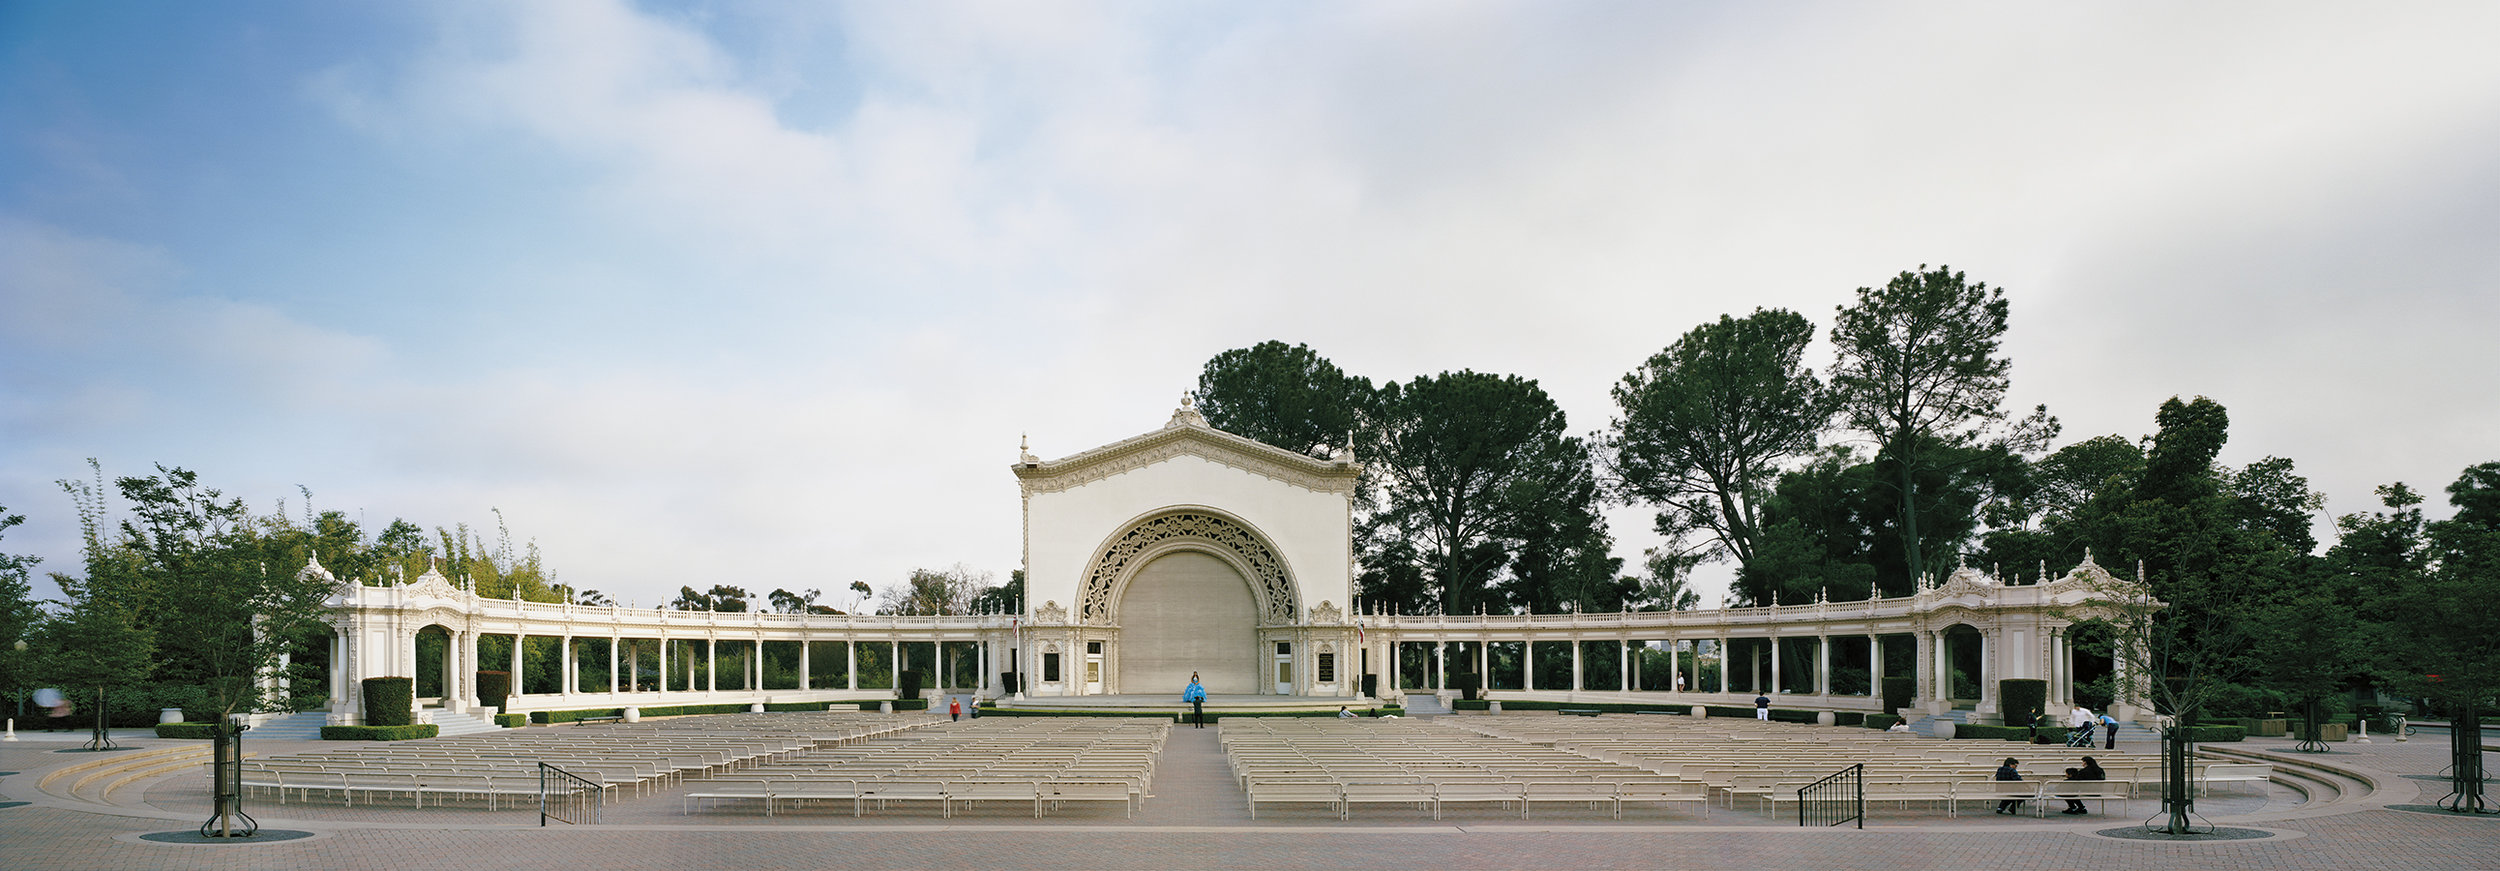 "San Diego 1915 World's Fair, ""Panama-California Exposition,"" Spreckels Organ Pavilion  23' x 8' 2015"